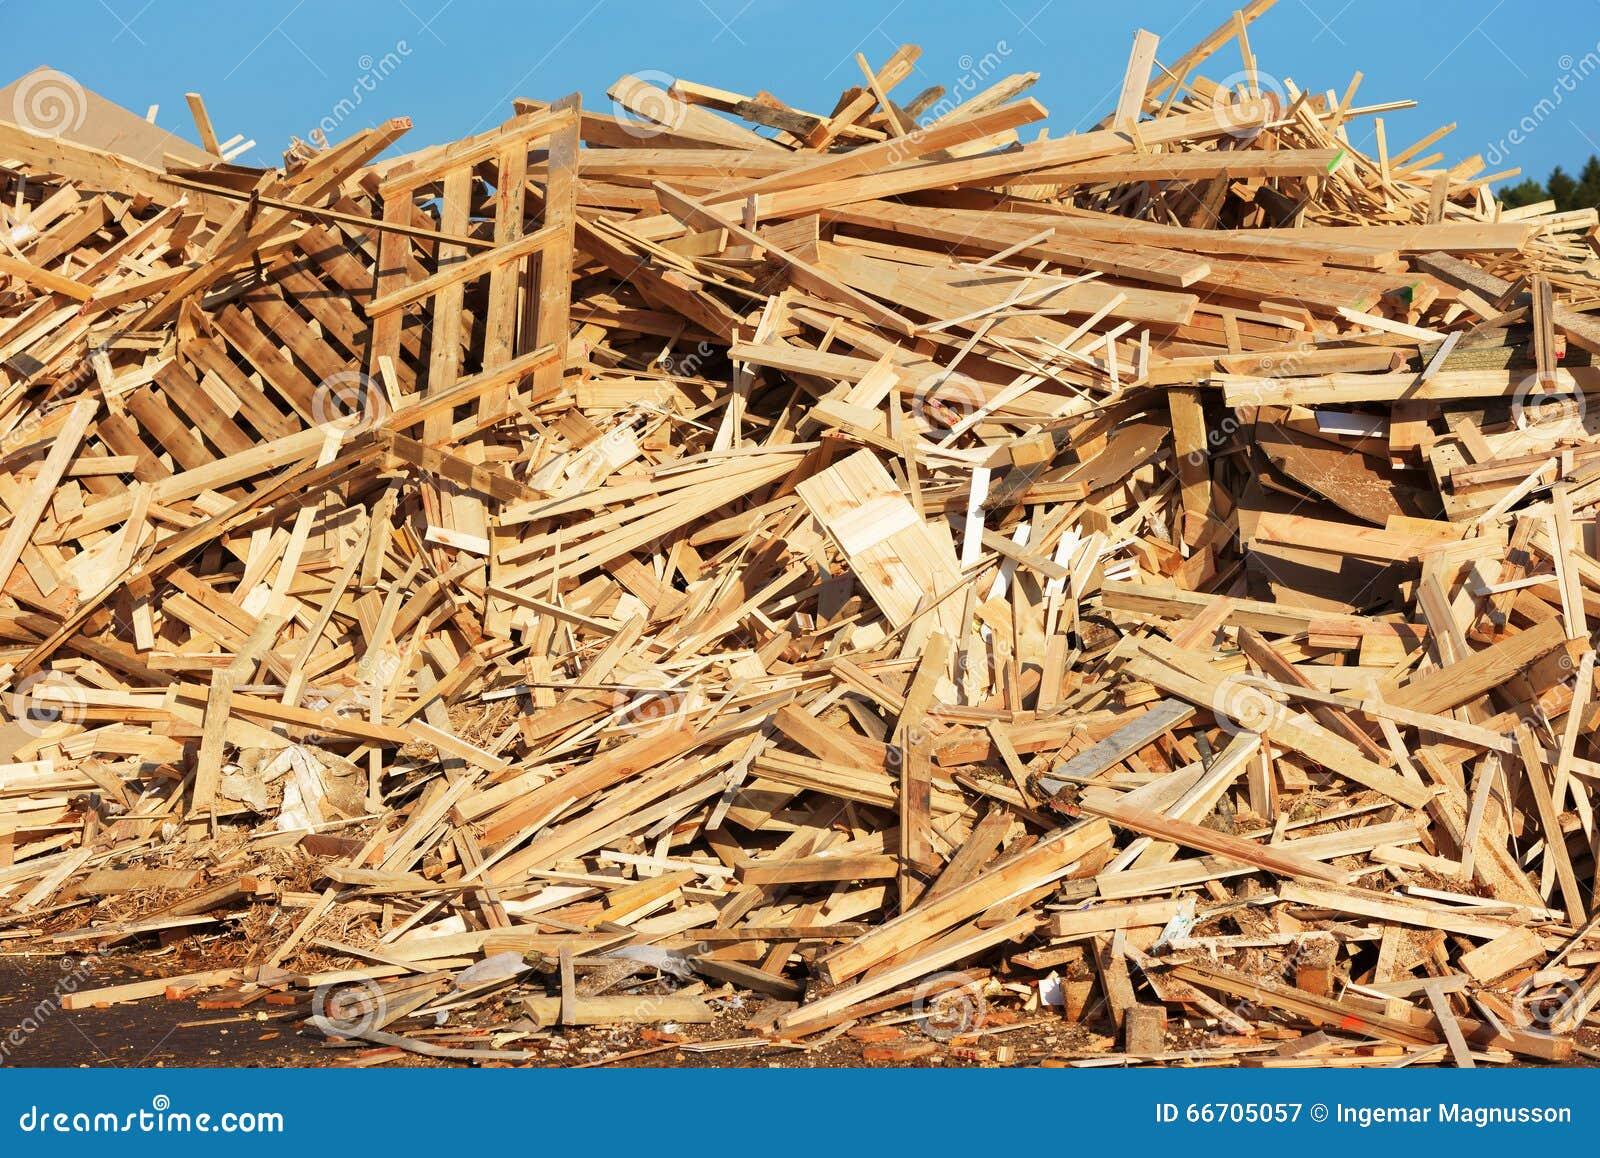 Pile Of Building Debris : Wooden debris stock photo image